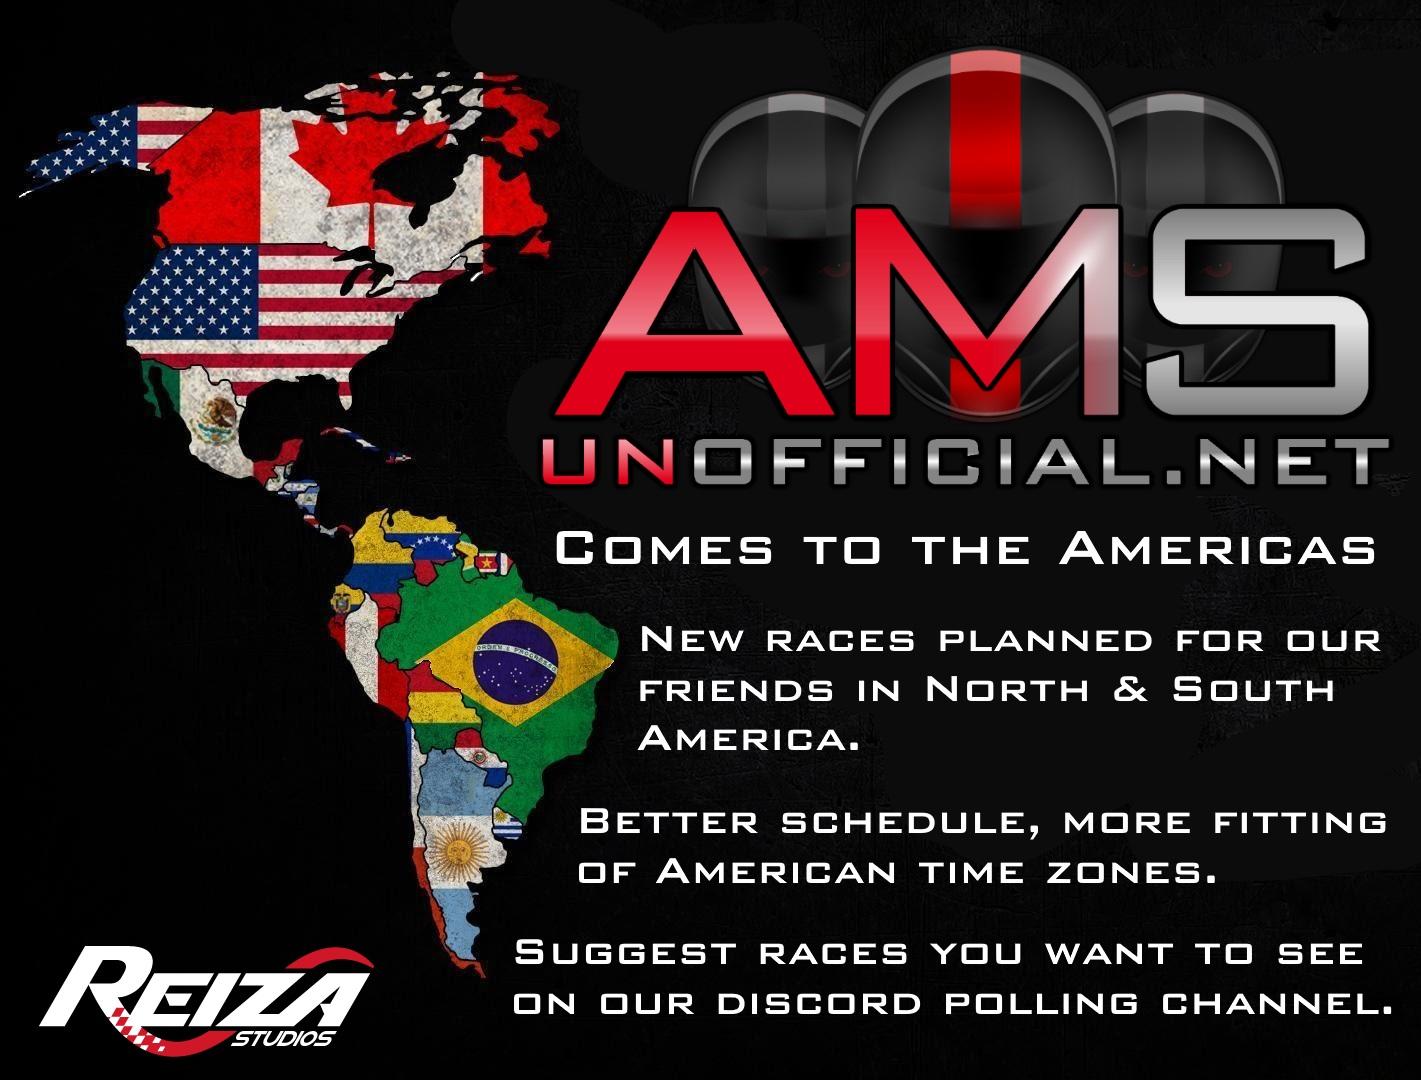 AMSU_Comes_To_The_Americas.jpg